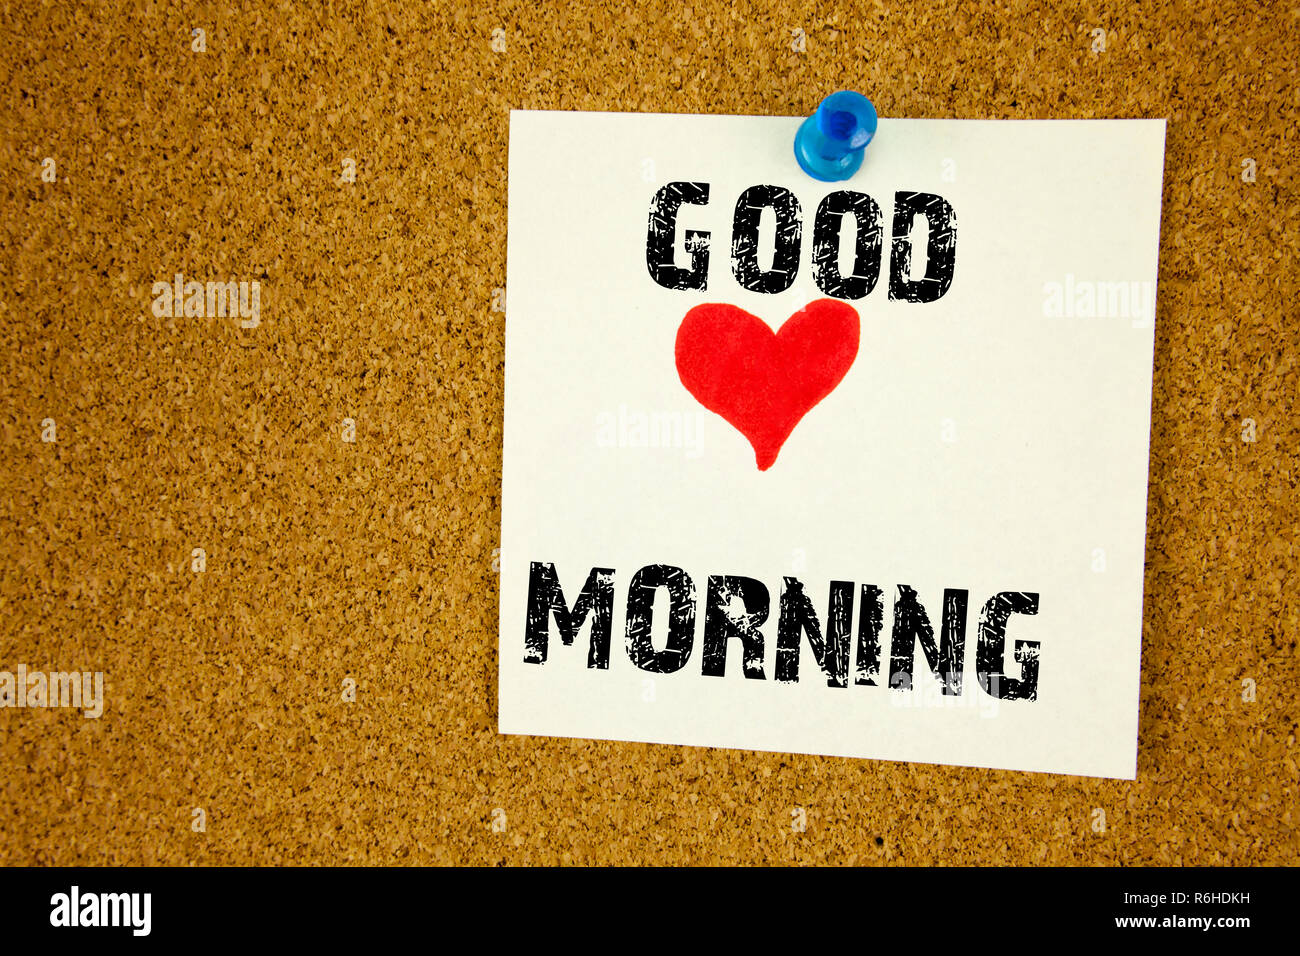 Guten morgen liebes bilder